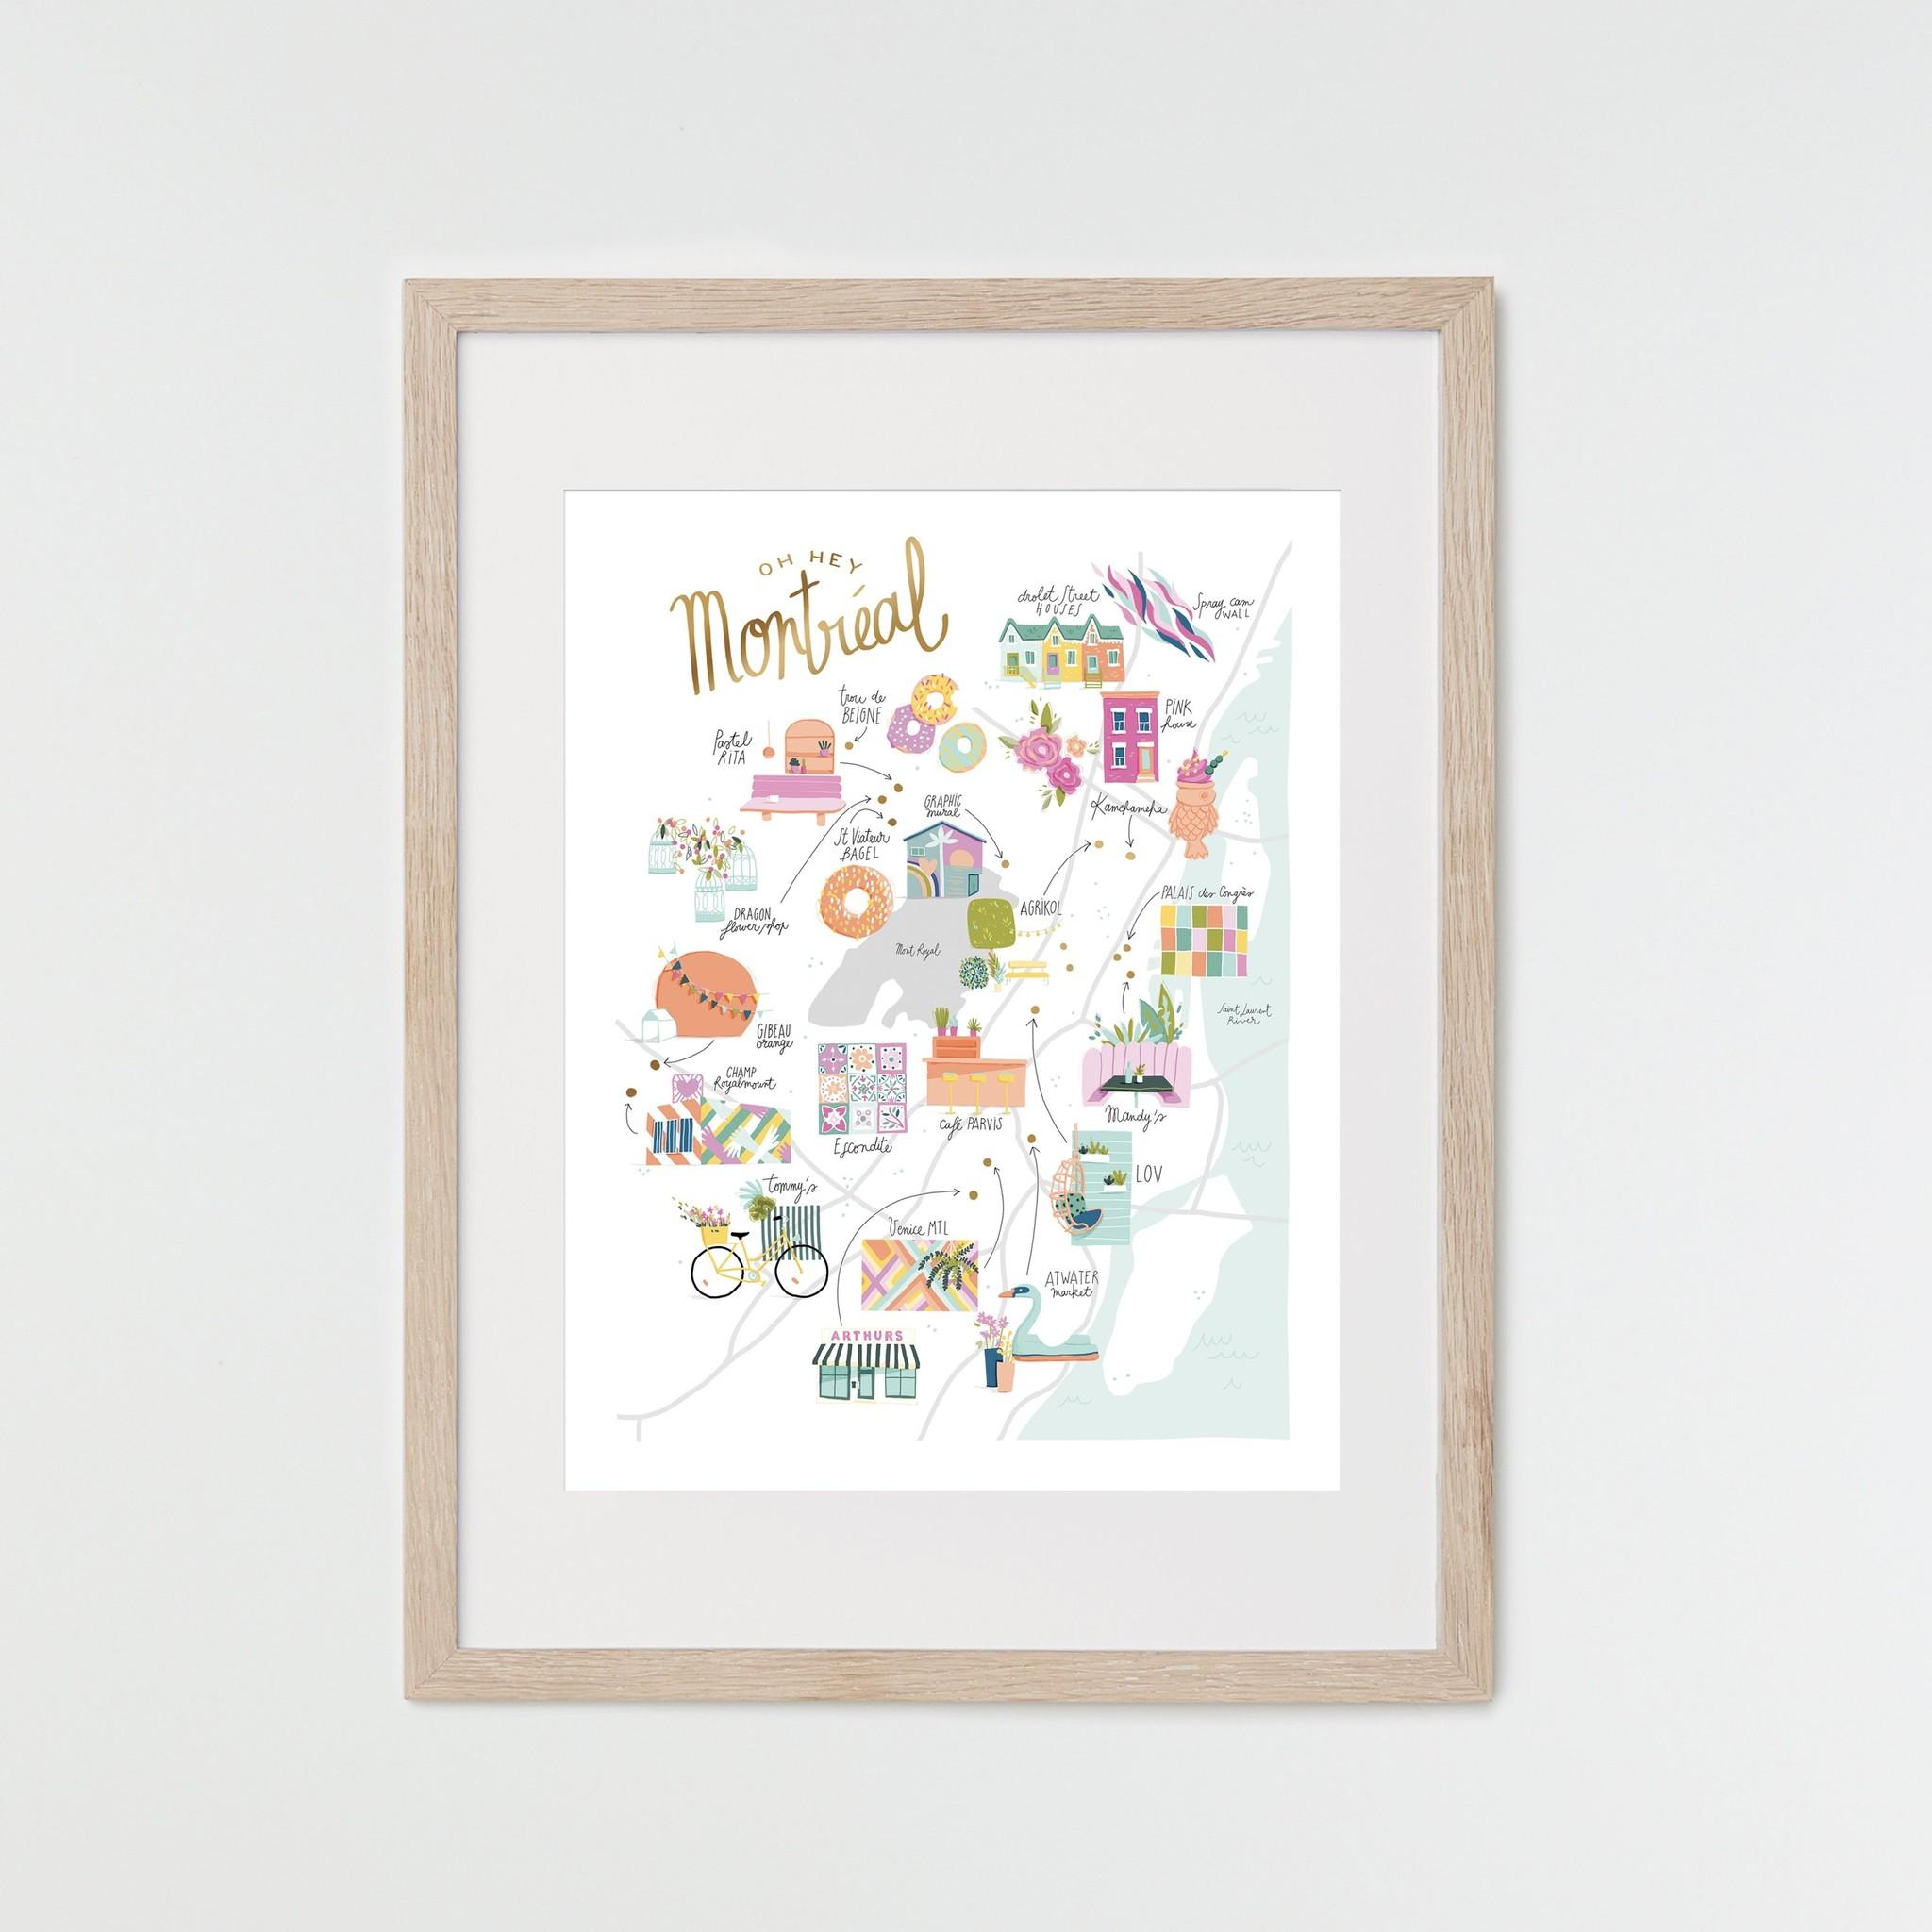 HeyMaca HeyMaca - MTL Hidden Gems Print (18x24)